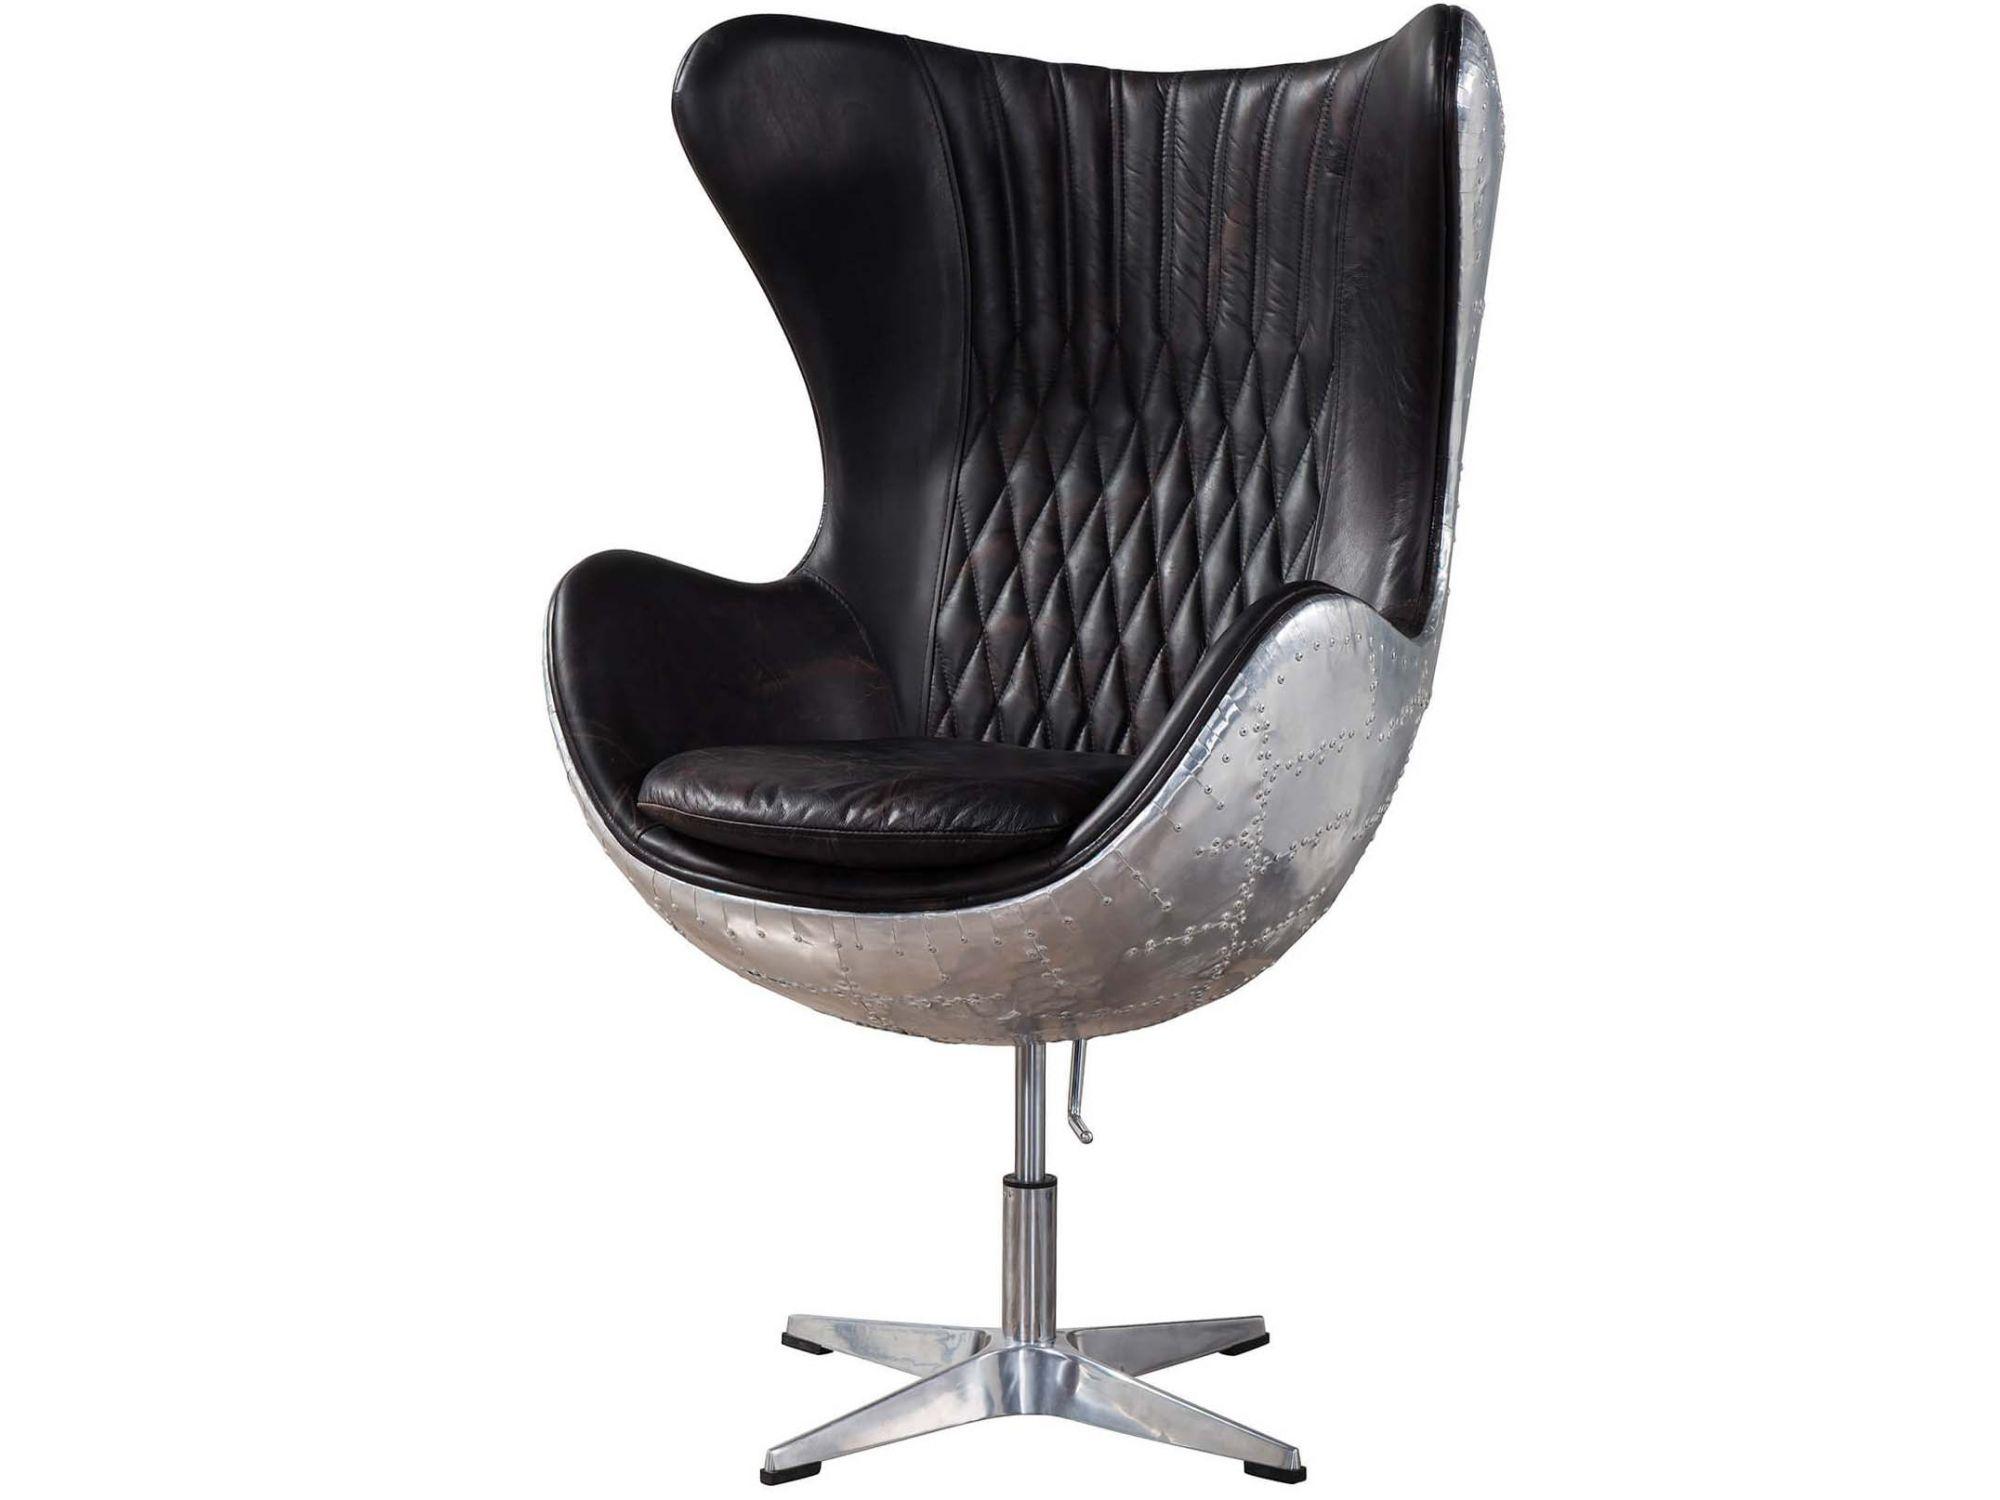 egg desk chair lounge chairs target aviator vintage leather fiberglass inner frame 43